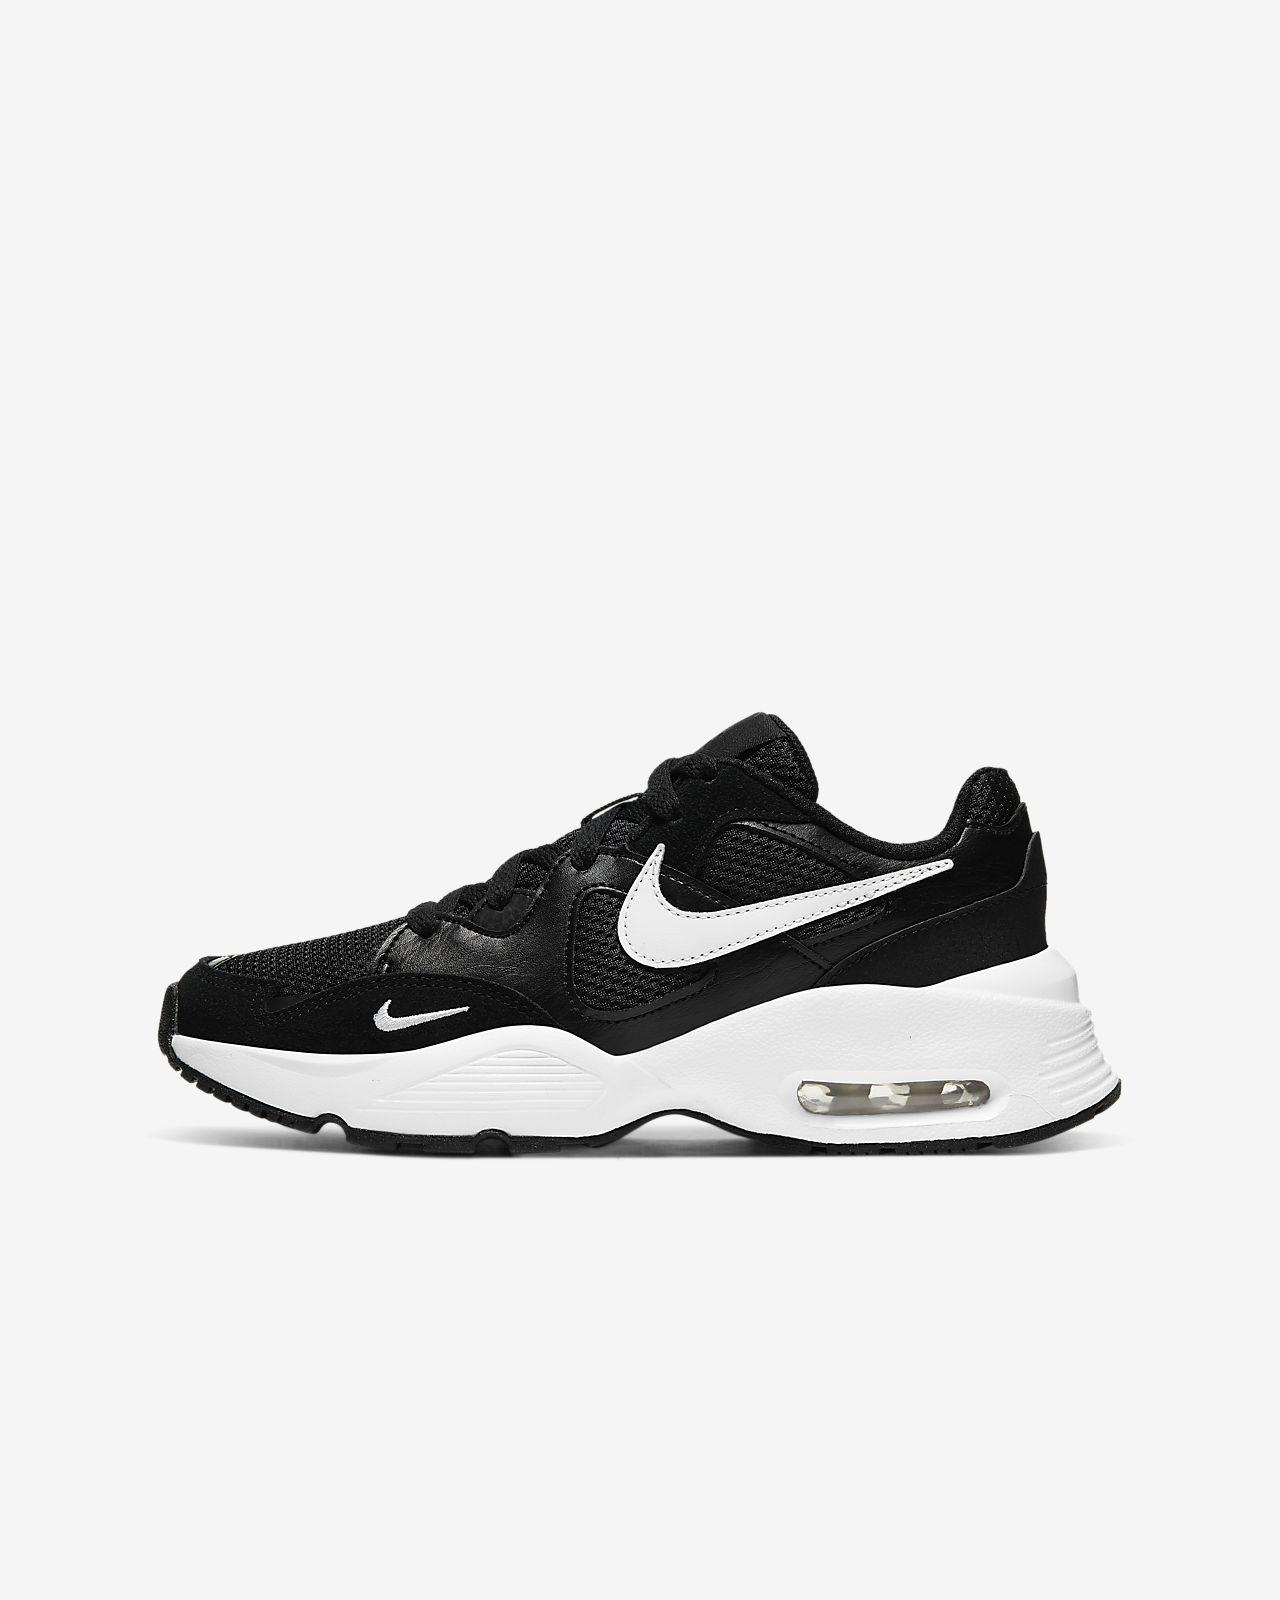 Nike Air Max Fusion Schuh für ältere Kinder